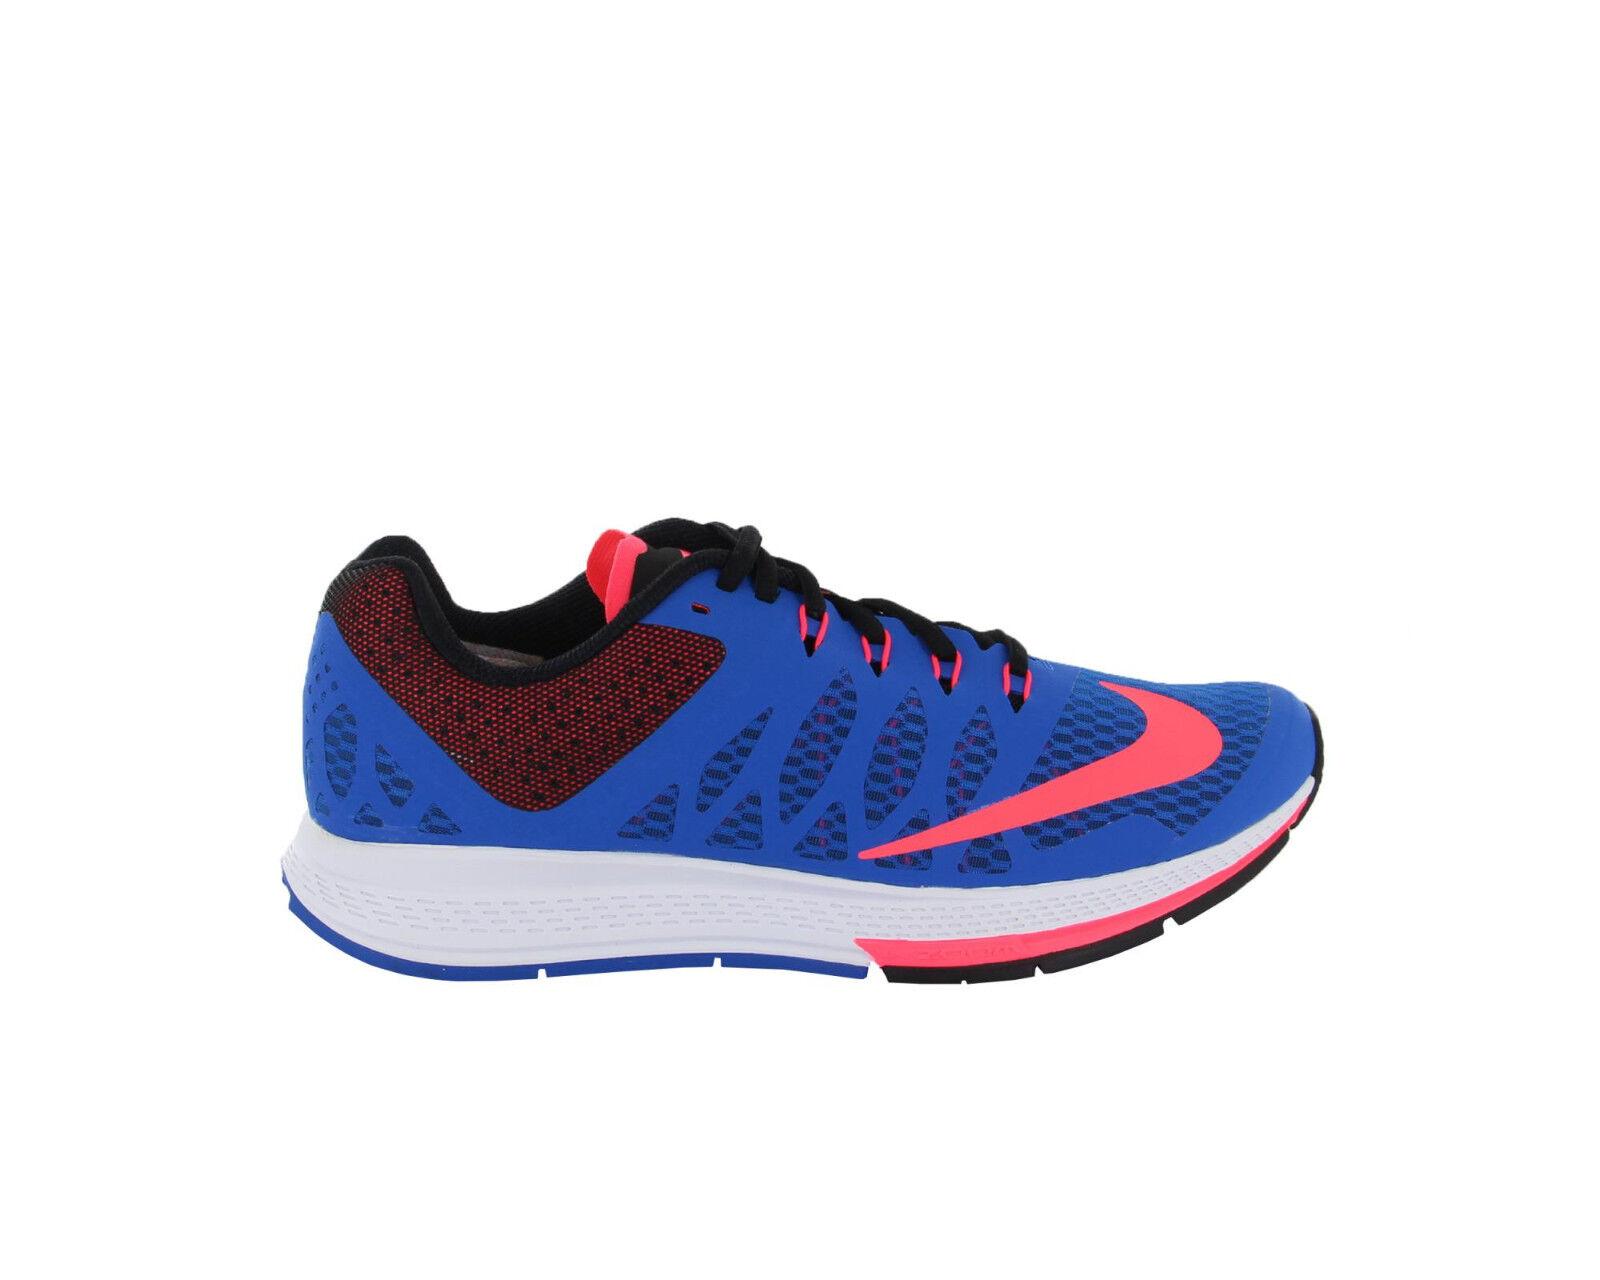 Men's Nike Air Zoom Elite 7 Sz 10-11.5 Hyper Cobalt Punch 654443-400 FREE SHIP Seasonal clearance sale